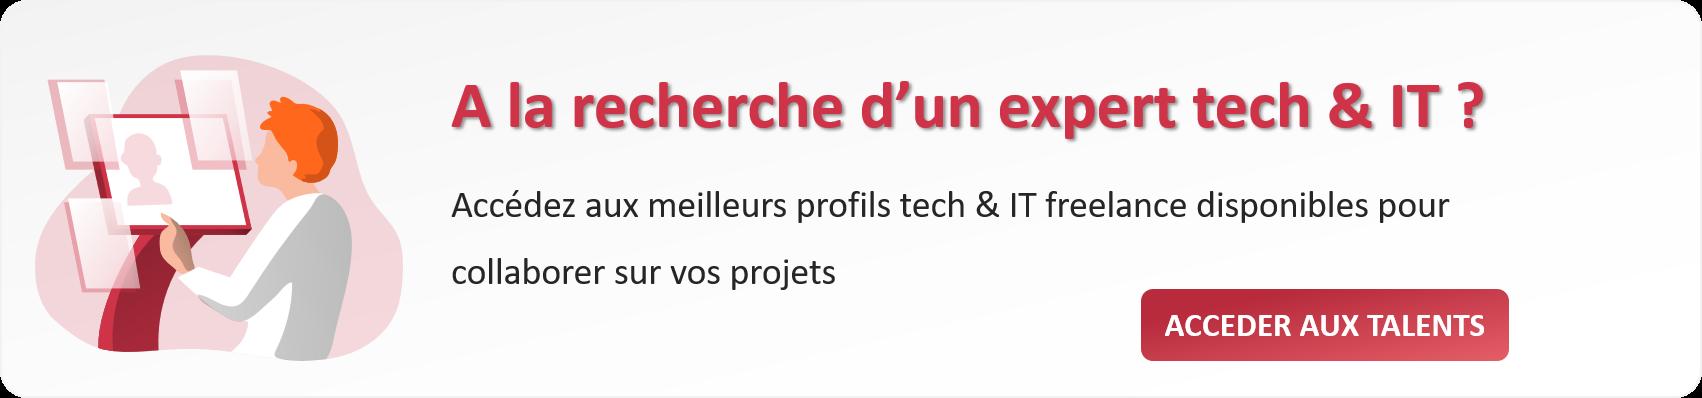 A la recherche d'un expert tech & IT ?